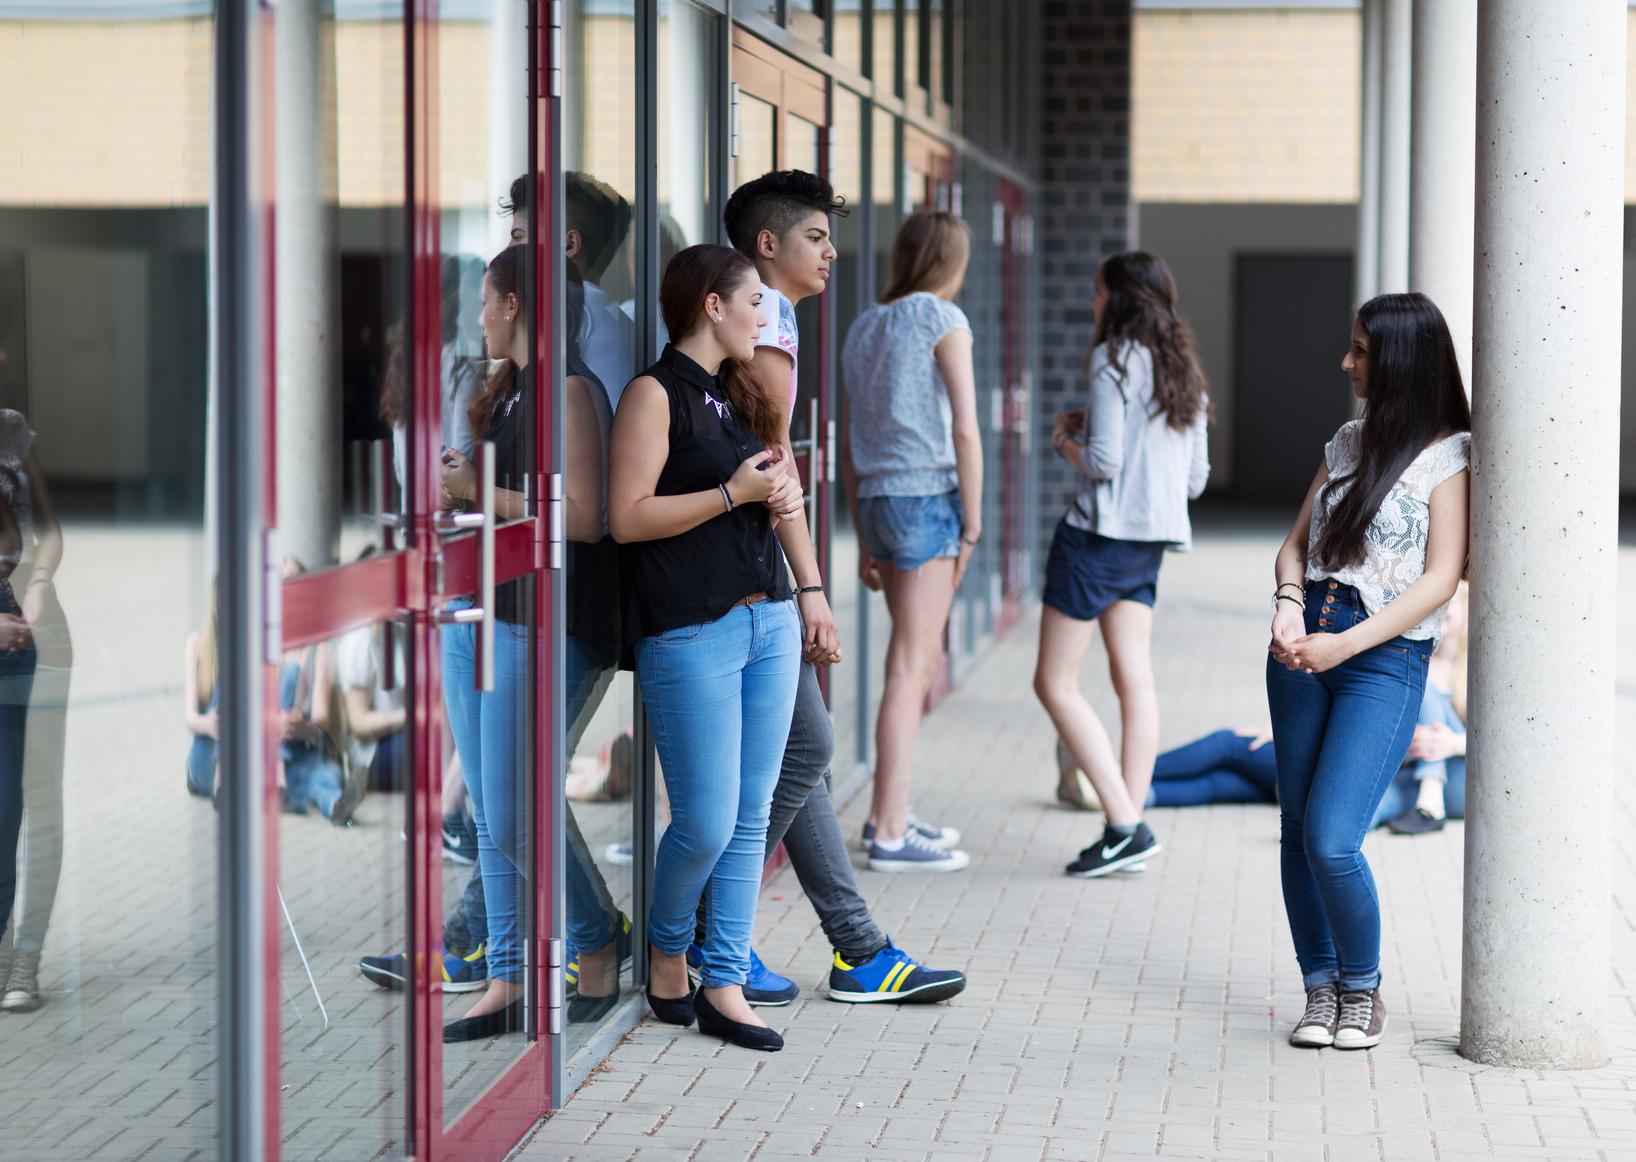 Pressemitteilung JAZz e.V. – Profis aus der Praxis coachen Schüler